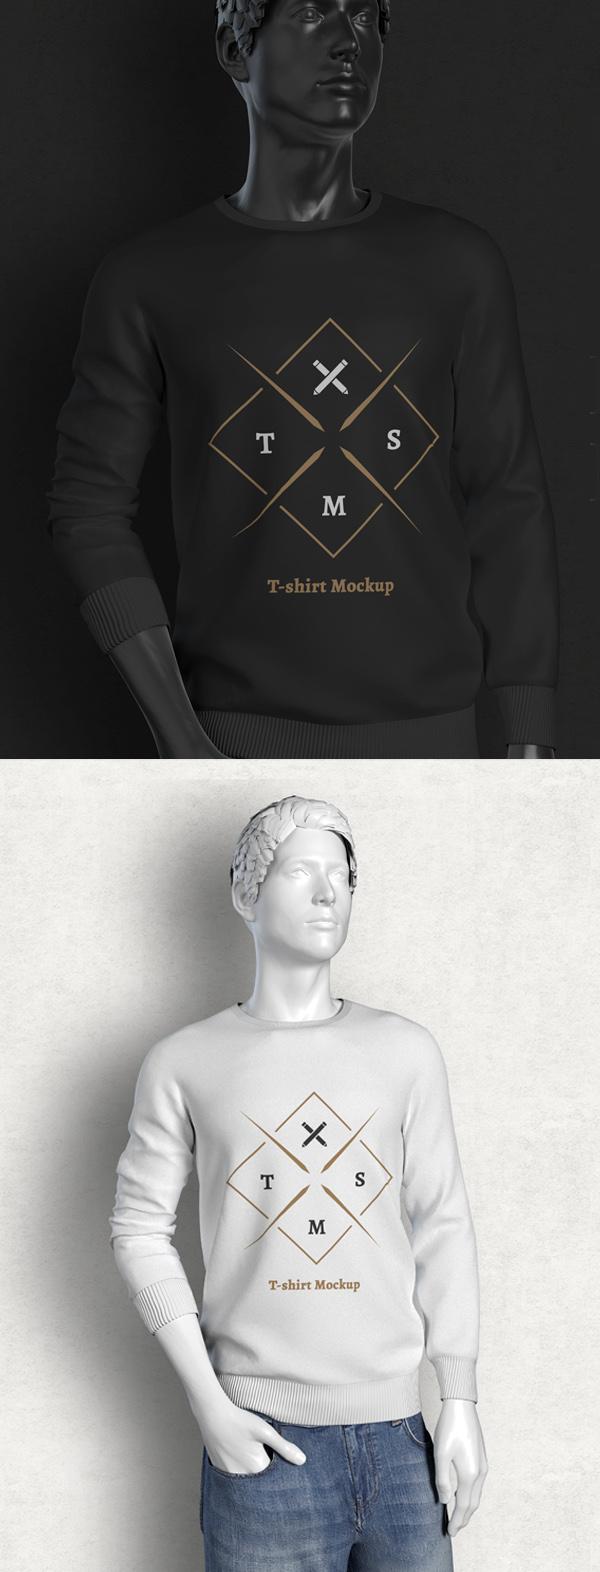 Mockup terbaru 2017 gratis - Free Long Sleeve T-shirt Mockup